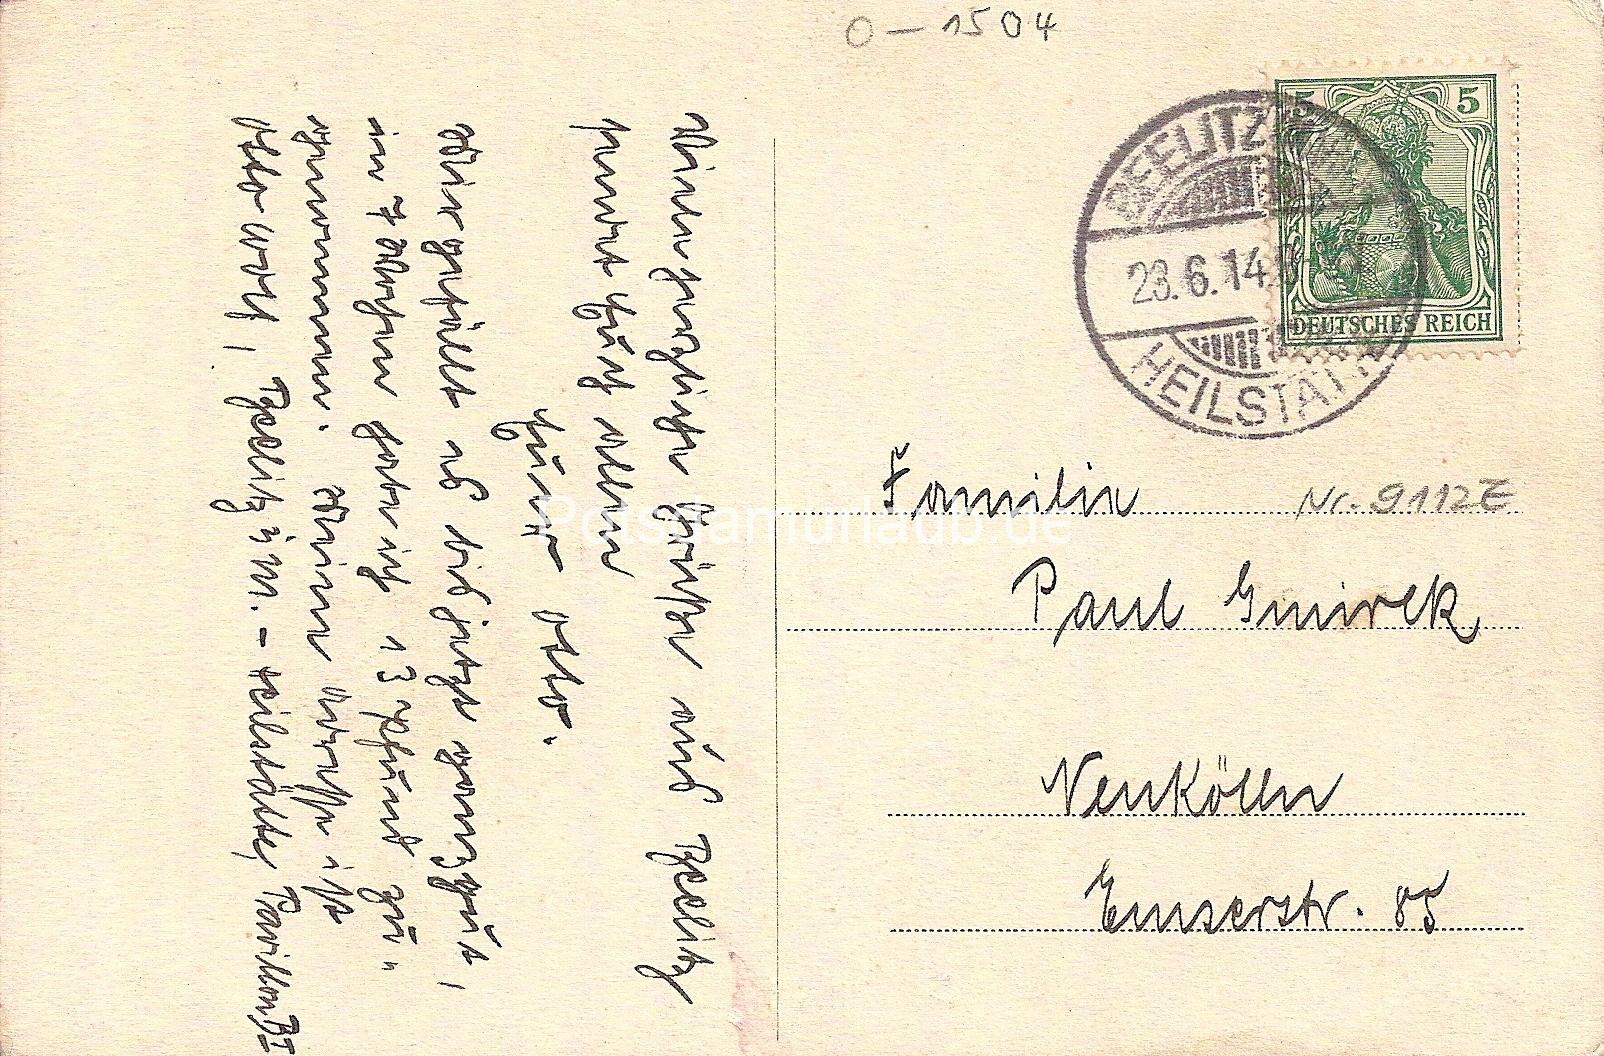 1914 06 23